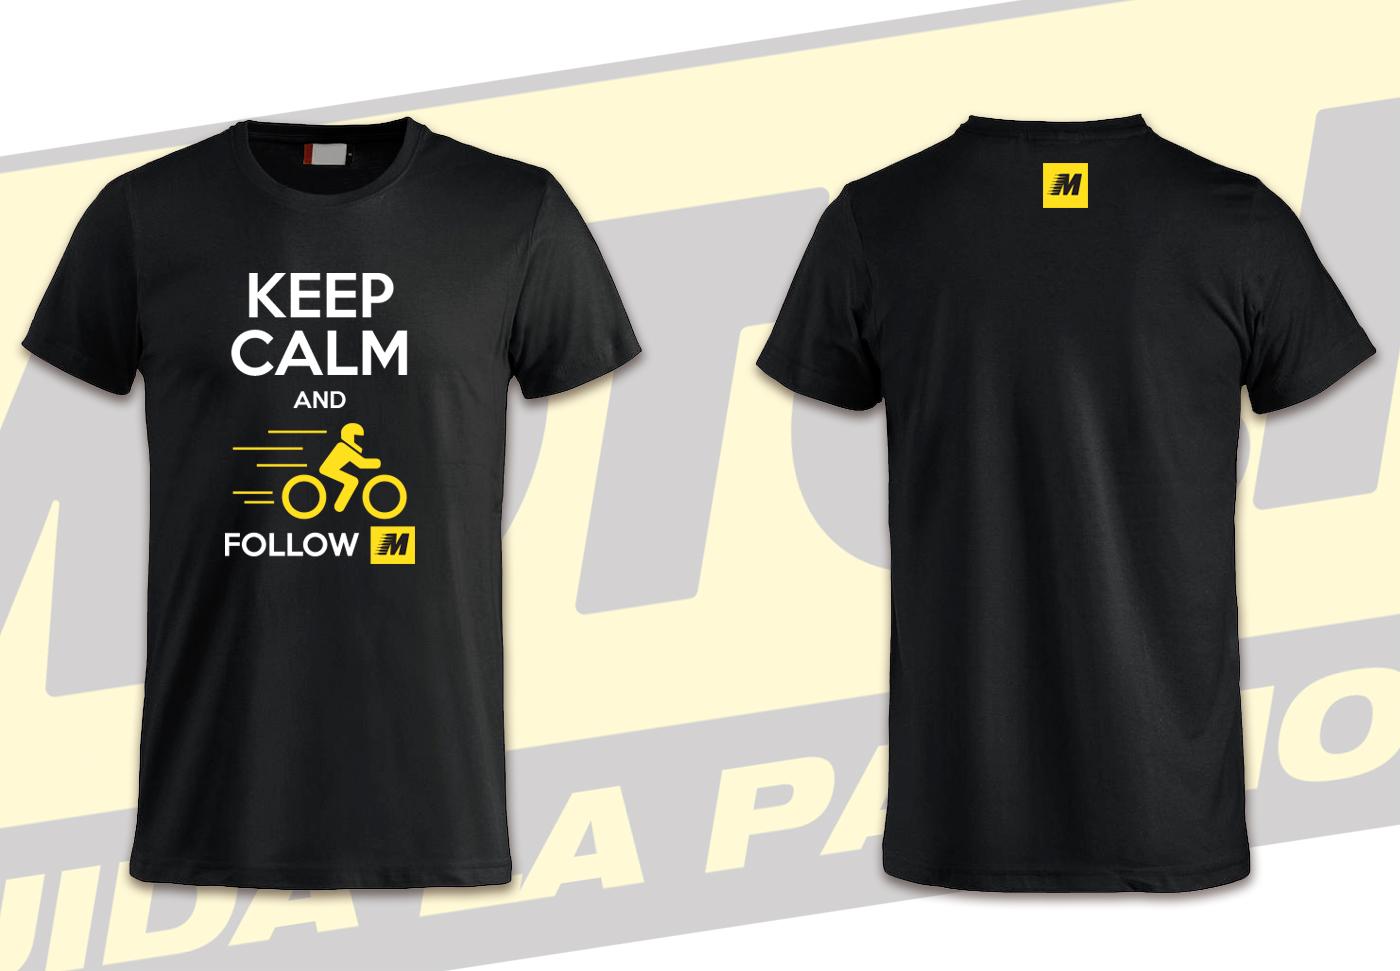 Chiba Promotion And Graphics MotoIt-T-Shirt